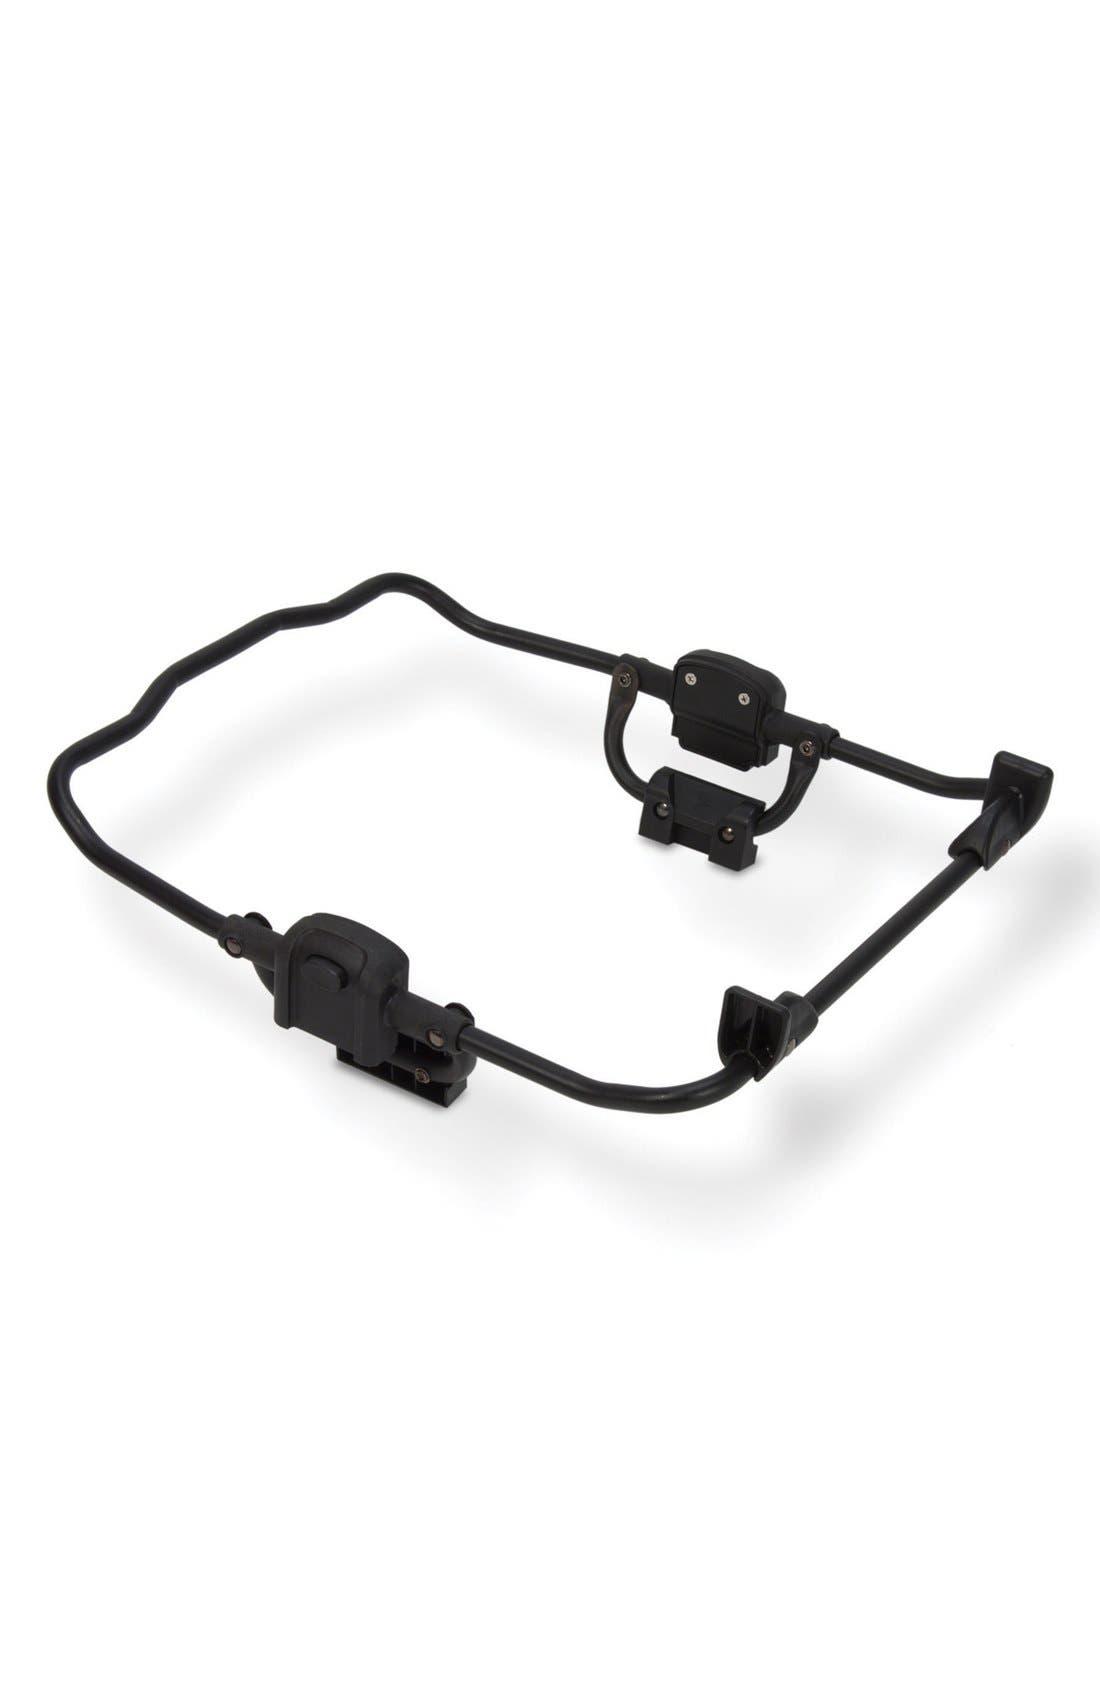 VISTA & CRUZ Stroller to Chicco<sup>®</sup> Car Seat Adapter,                         Main,                         color, BLACK